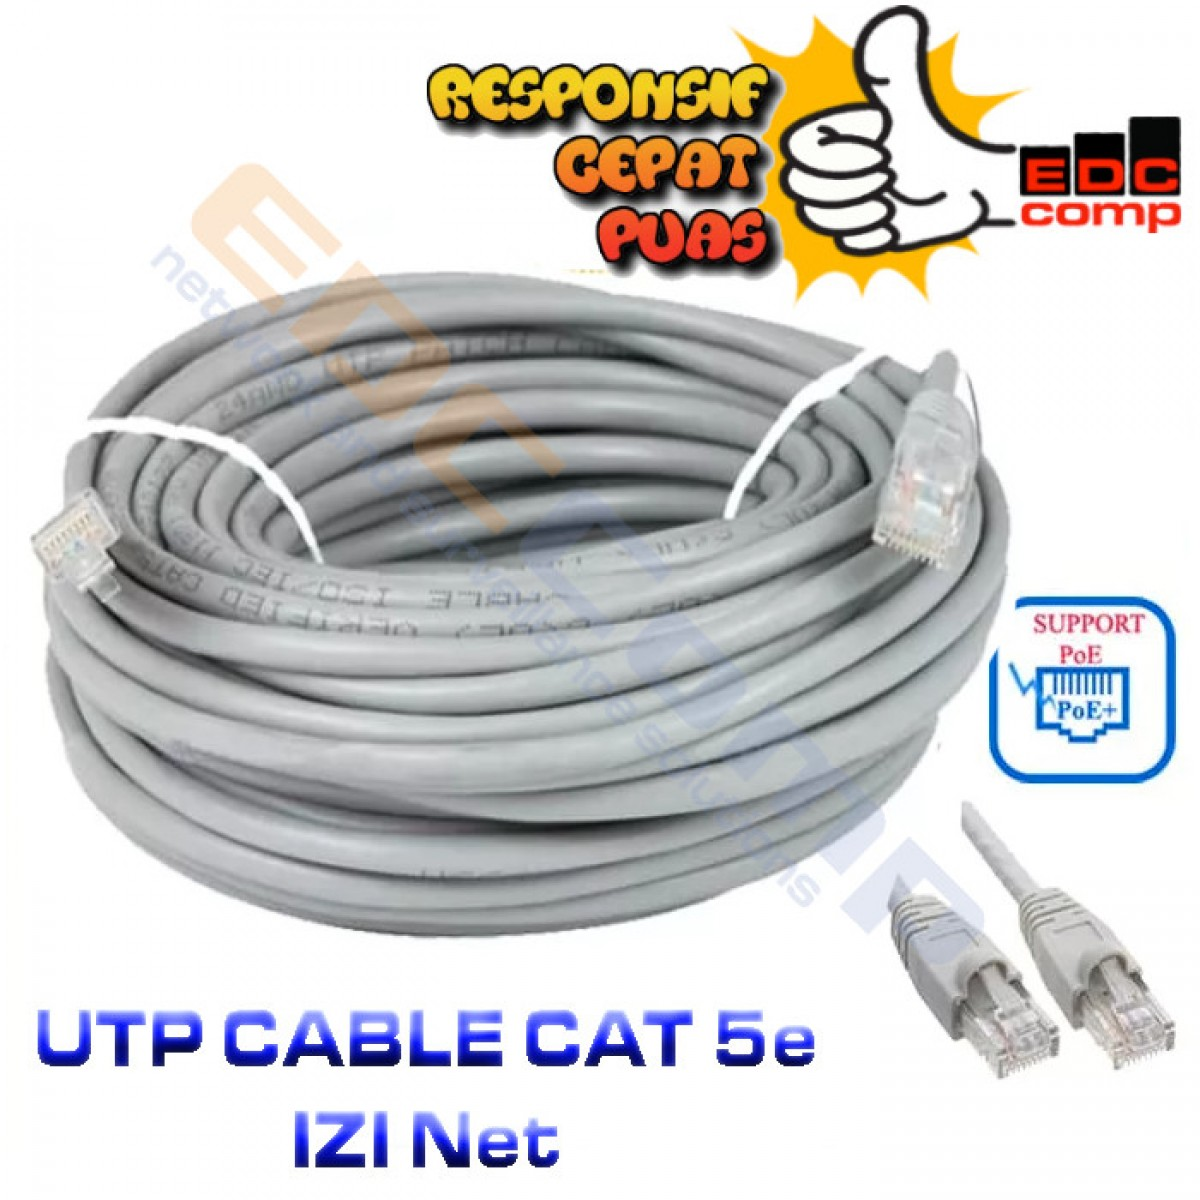 UTP Cable IZINET Cat5E 25 Meter - EdcComp